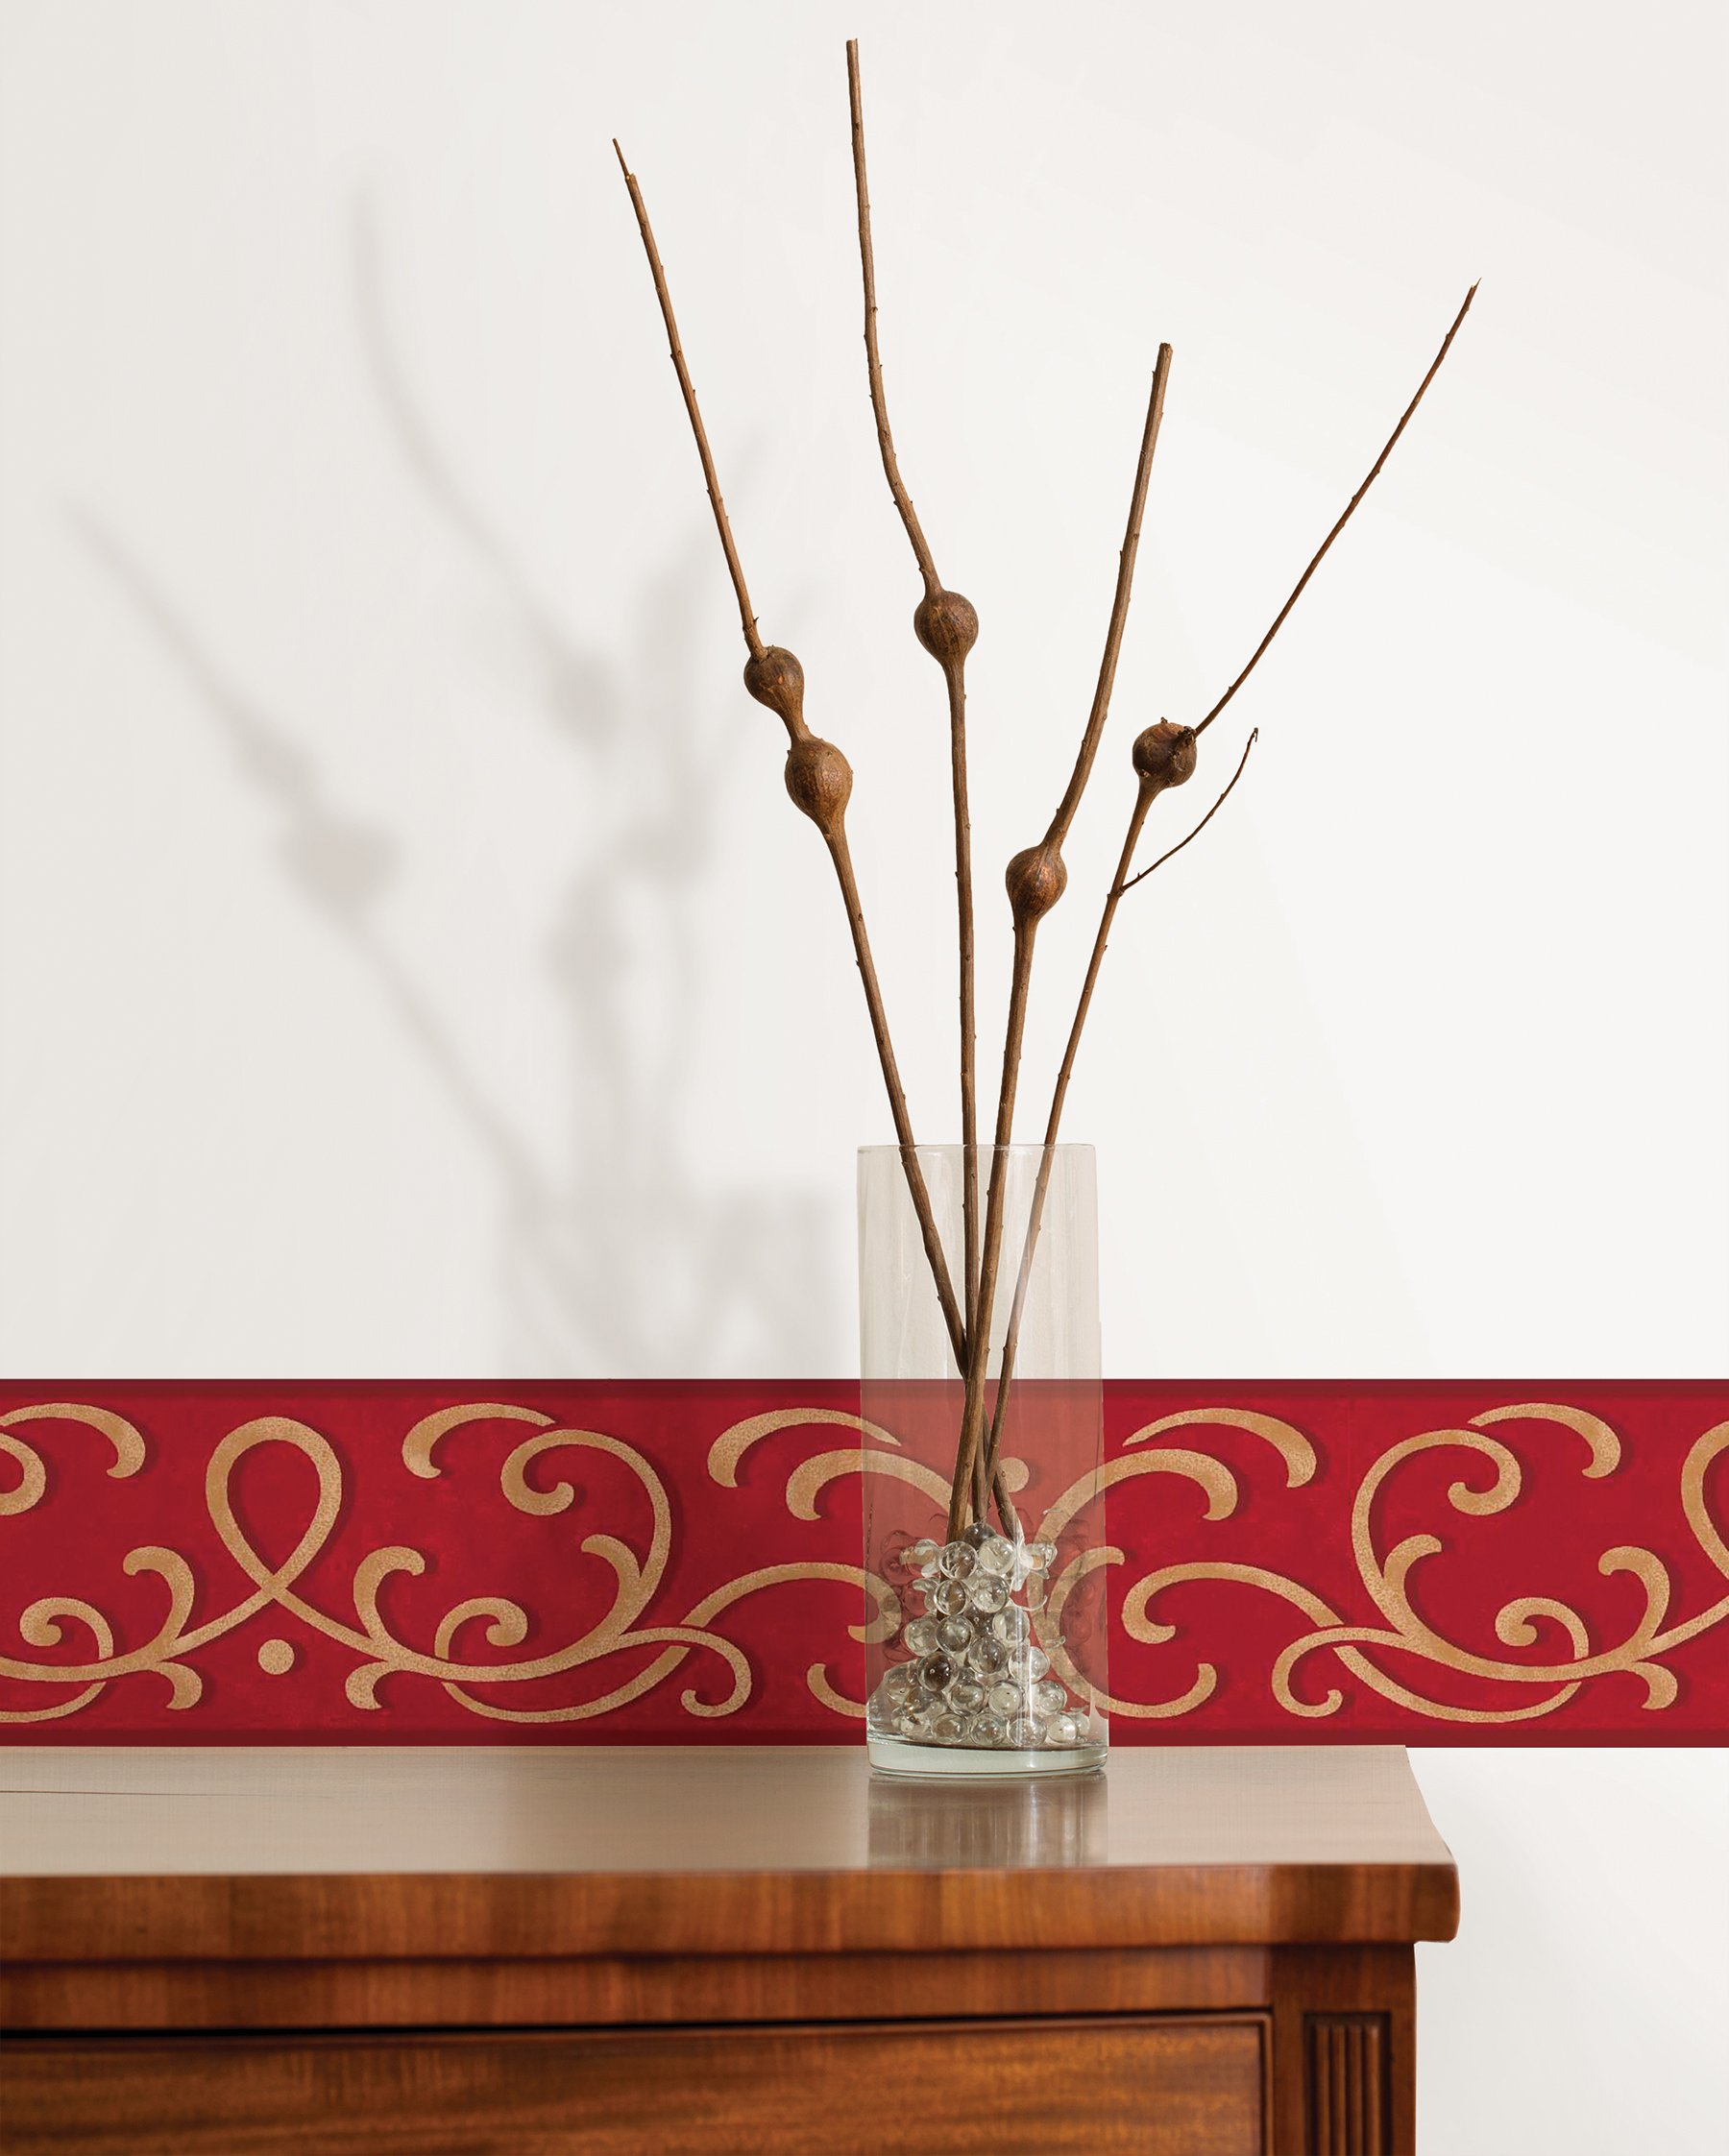 Fine Decor FDB07503S Red Carmen Peel & Stick Border by Fine Decor (Image #2)